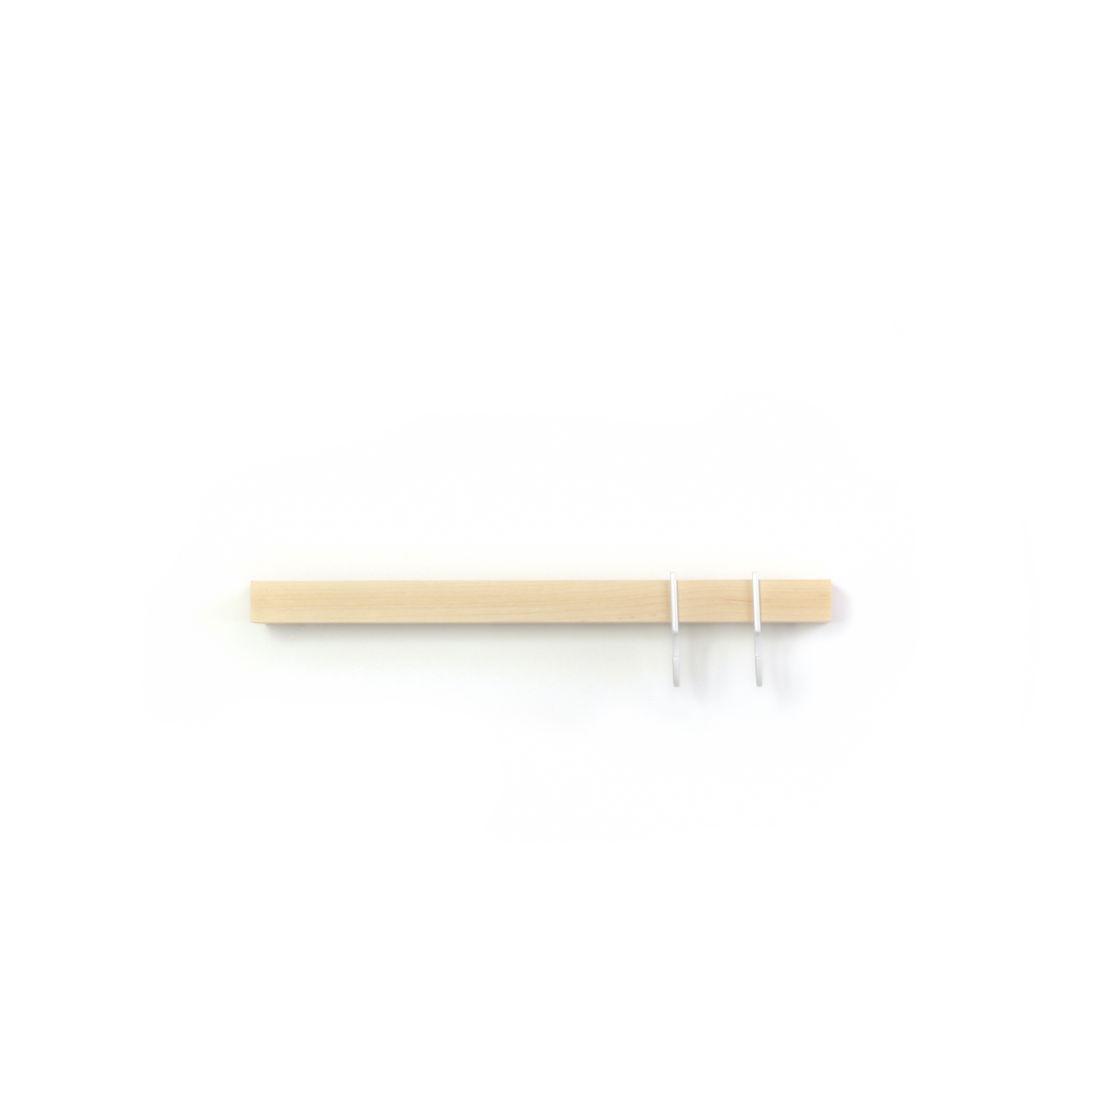 FIGR1 Wandplank eik - surface - 30 €29,95